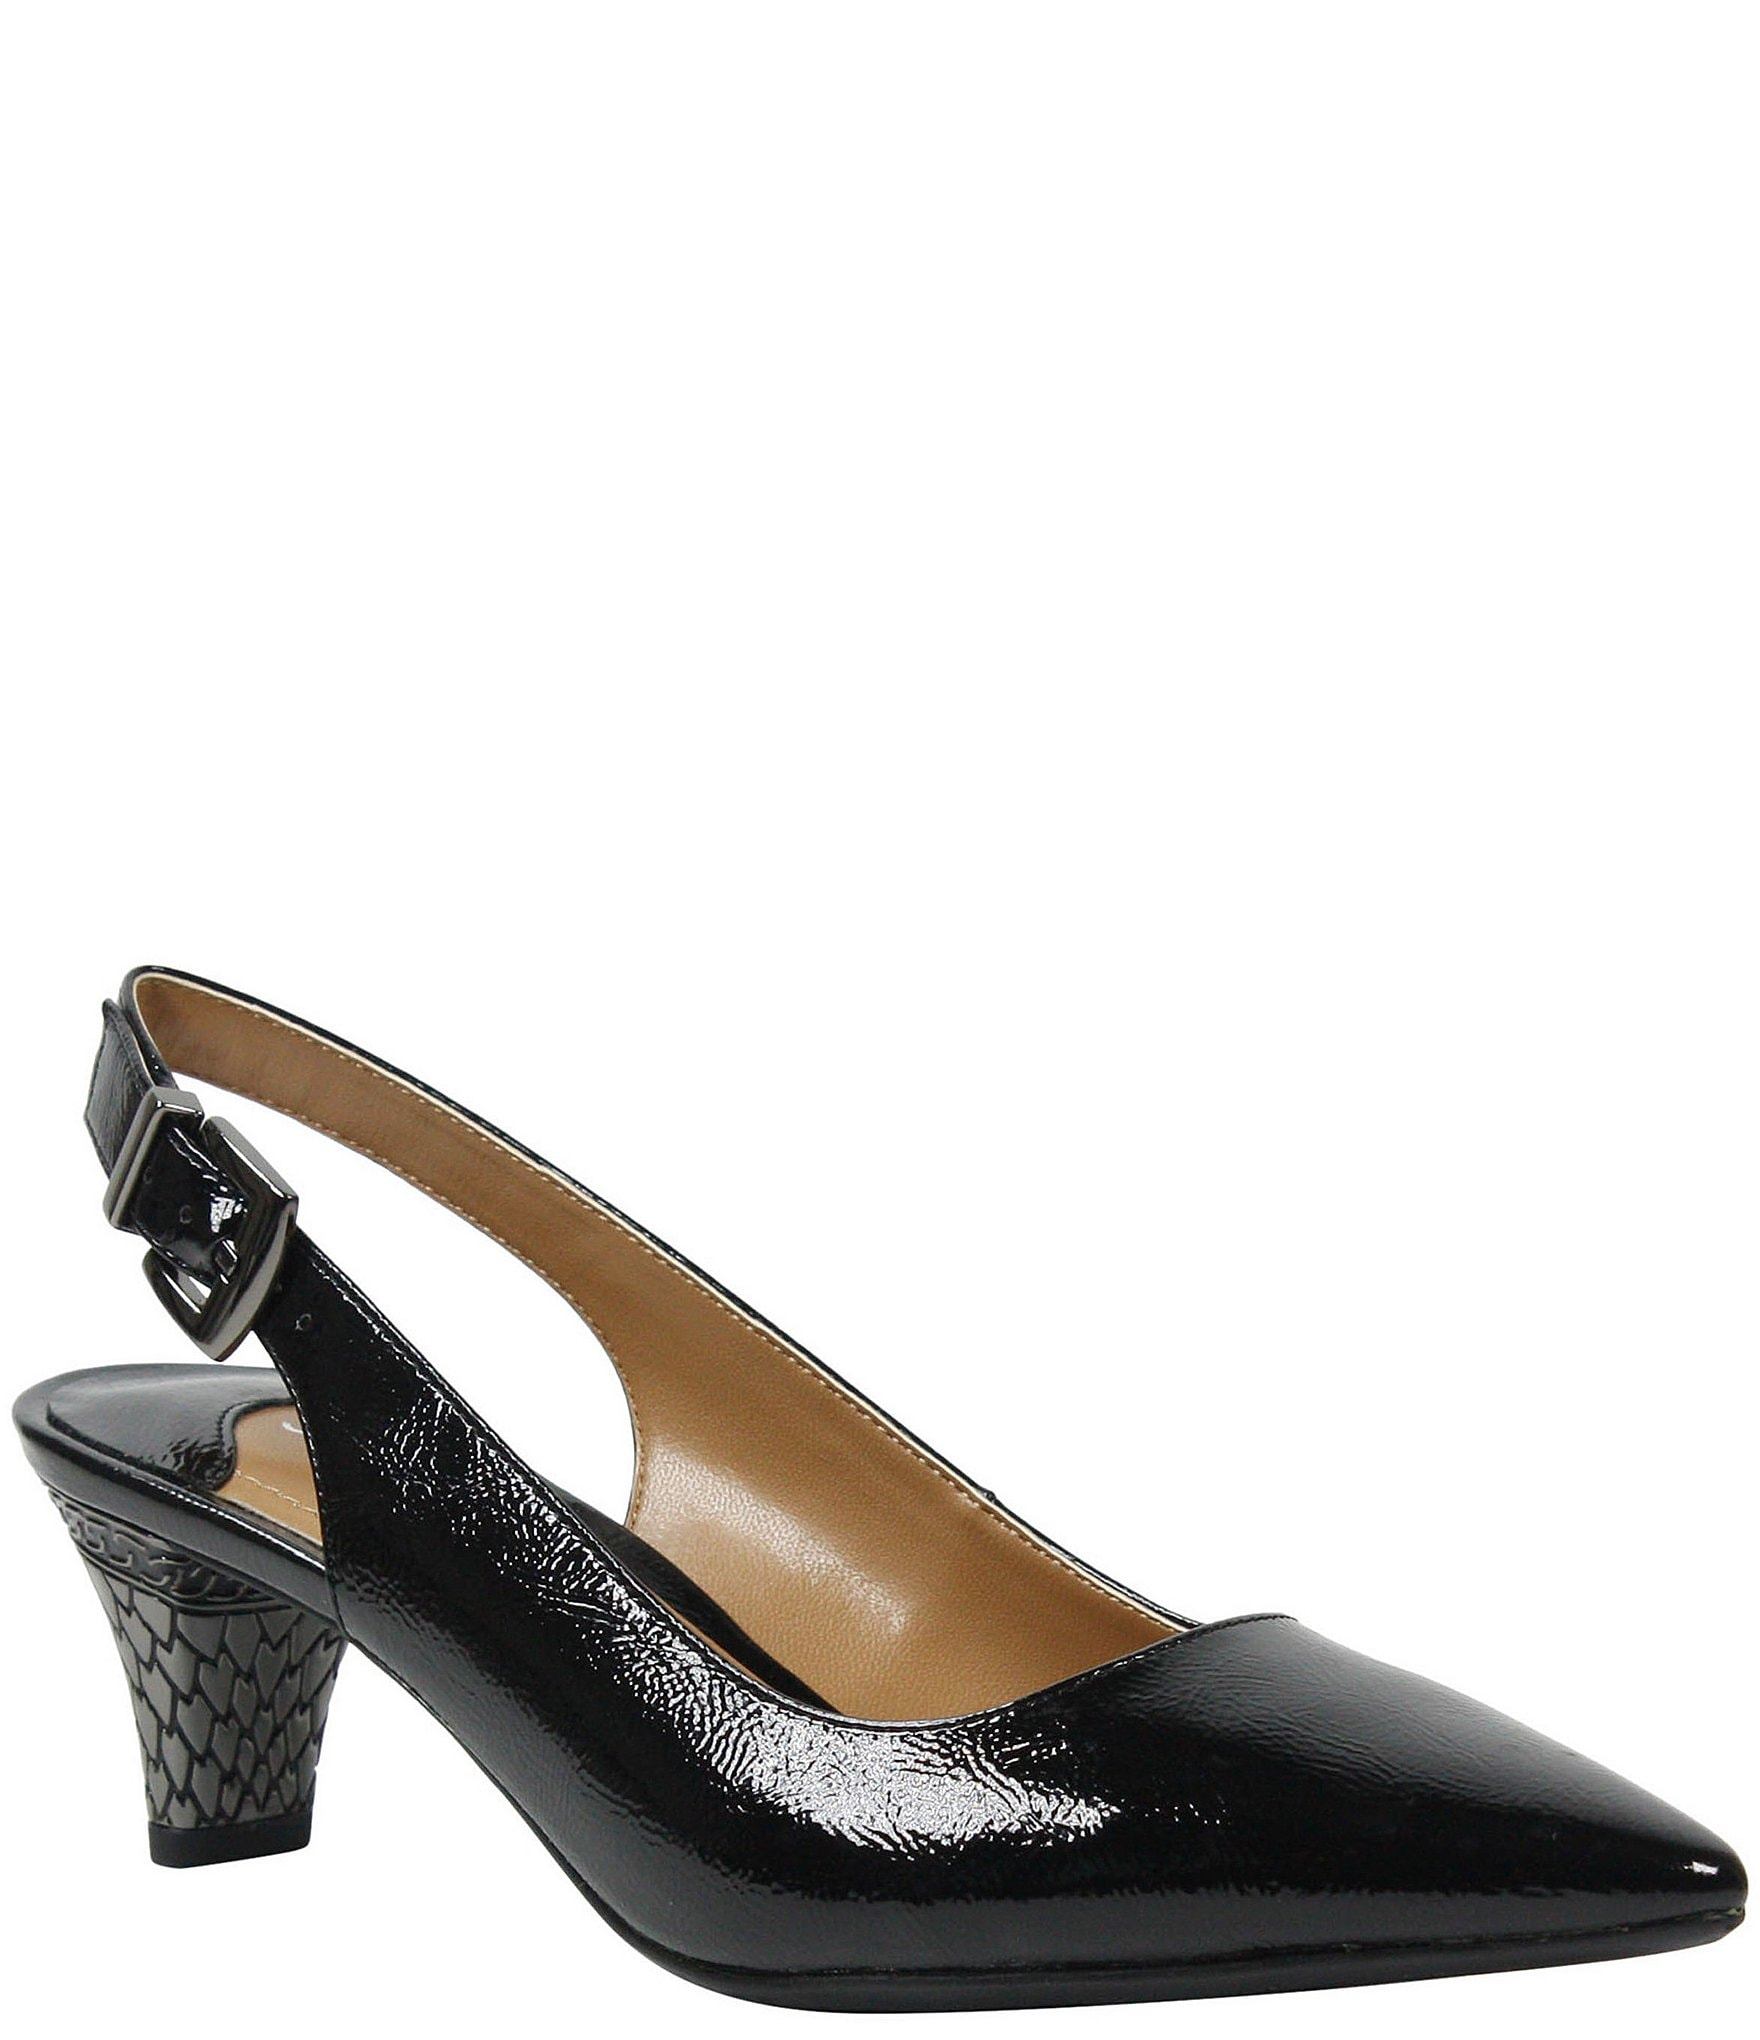 e8b2edf4612d Women's Shoes | Dillard's